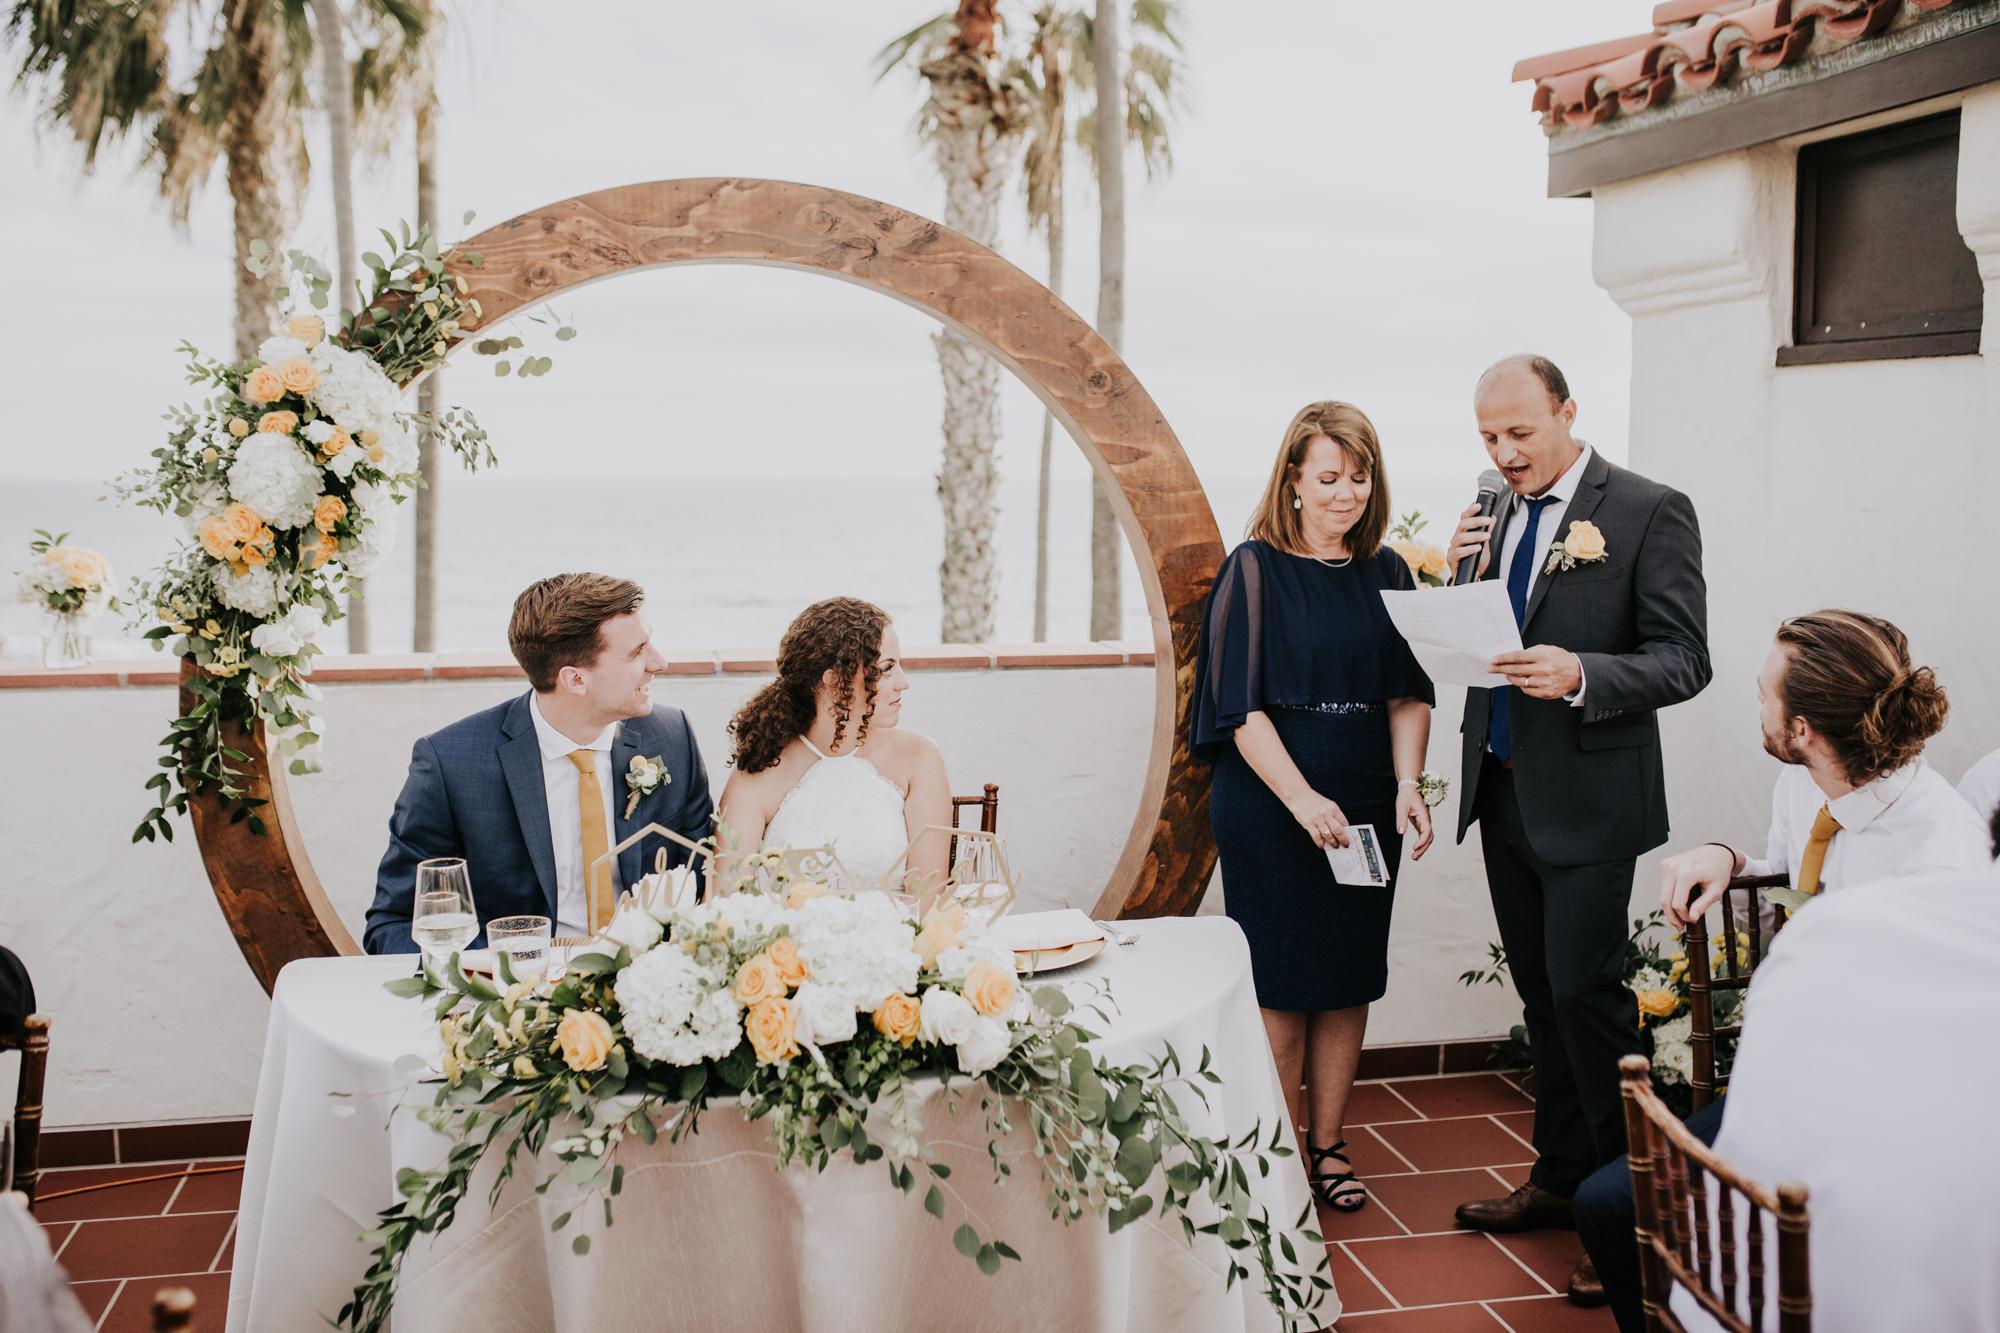 122-destination-wedding-san-clemente-california.jpg